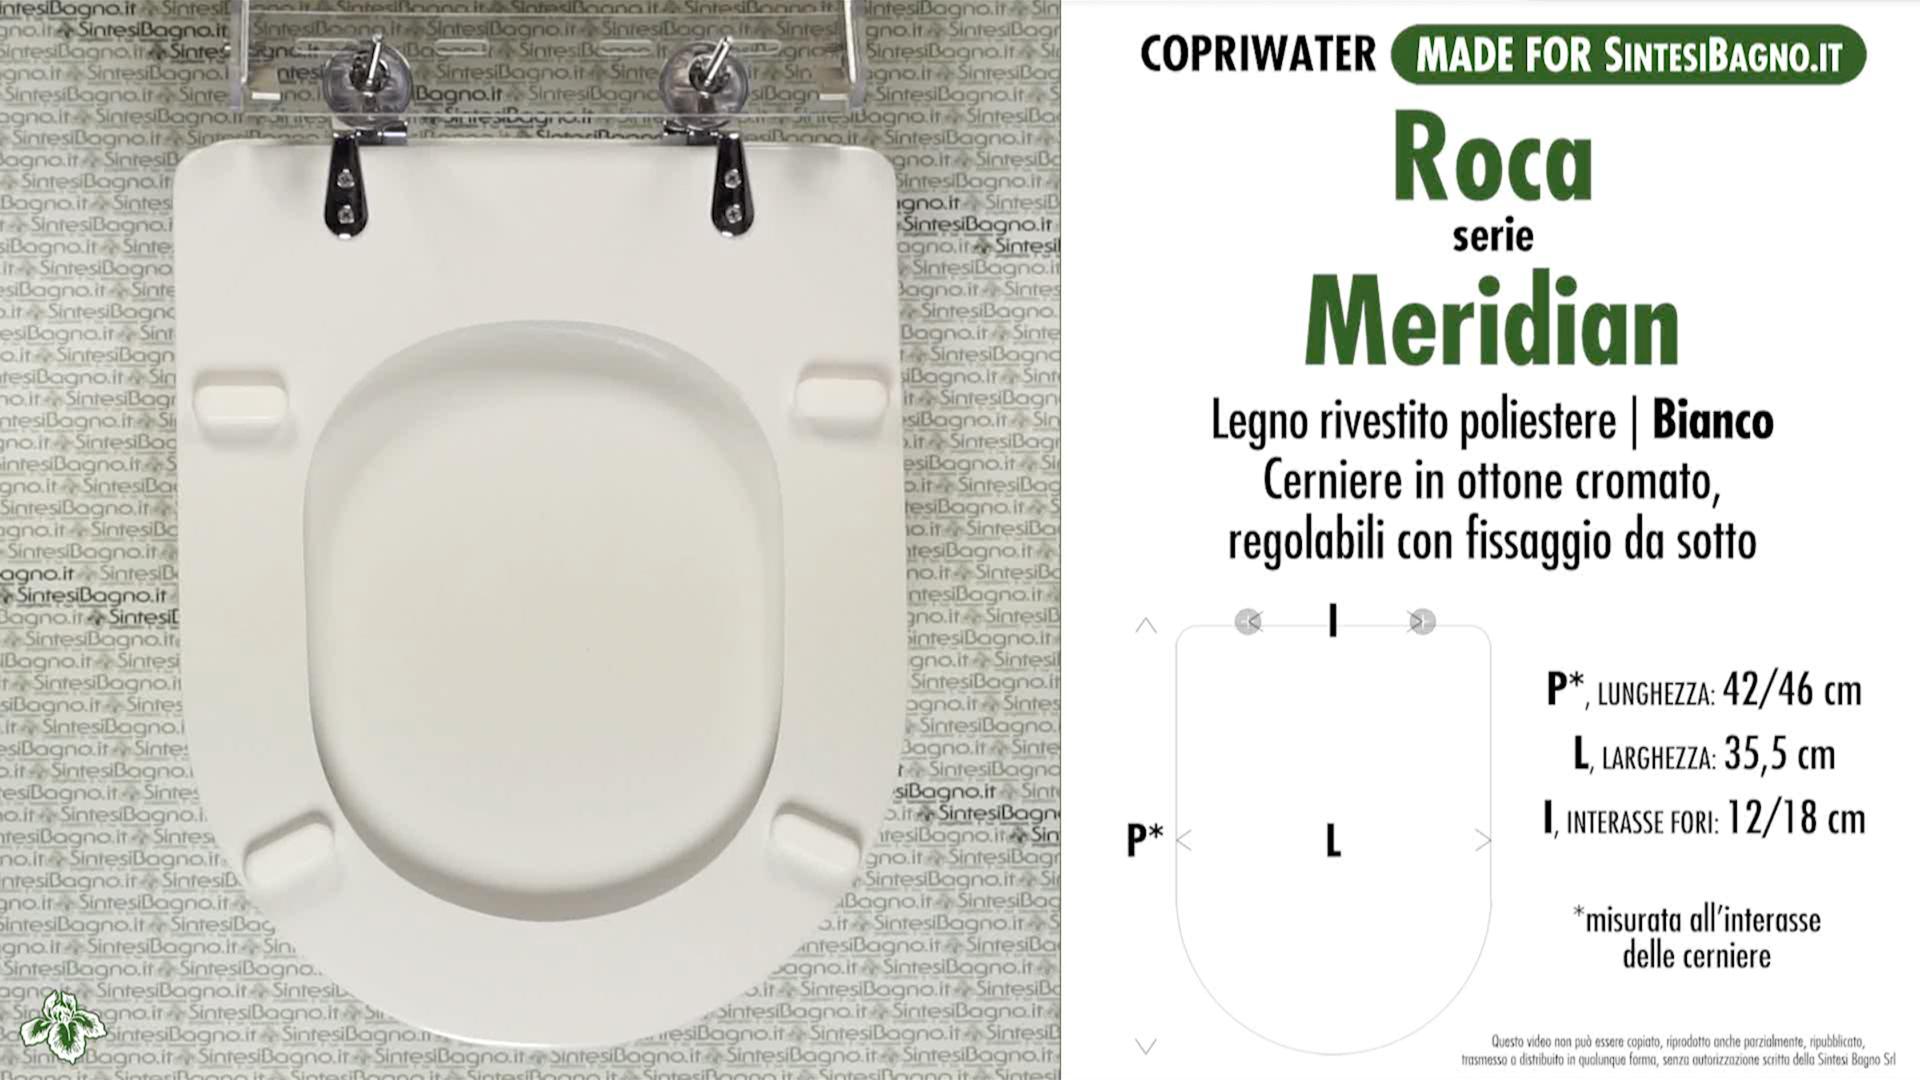 SCHEDA TECNICA MISURE copriwater ROCA MERIDIAN